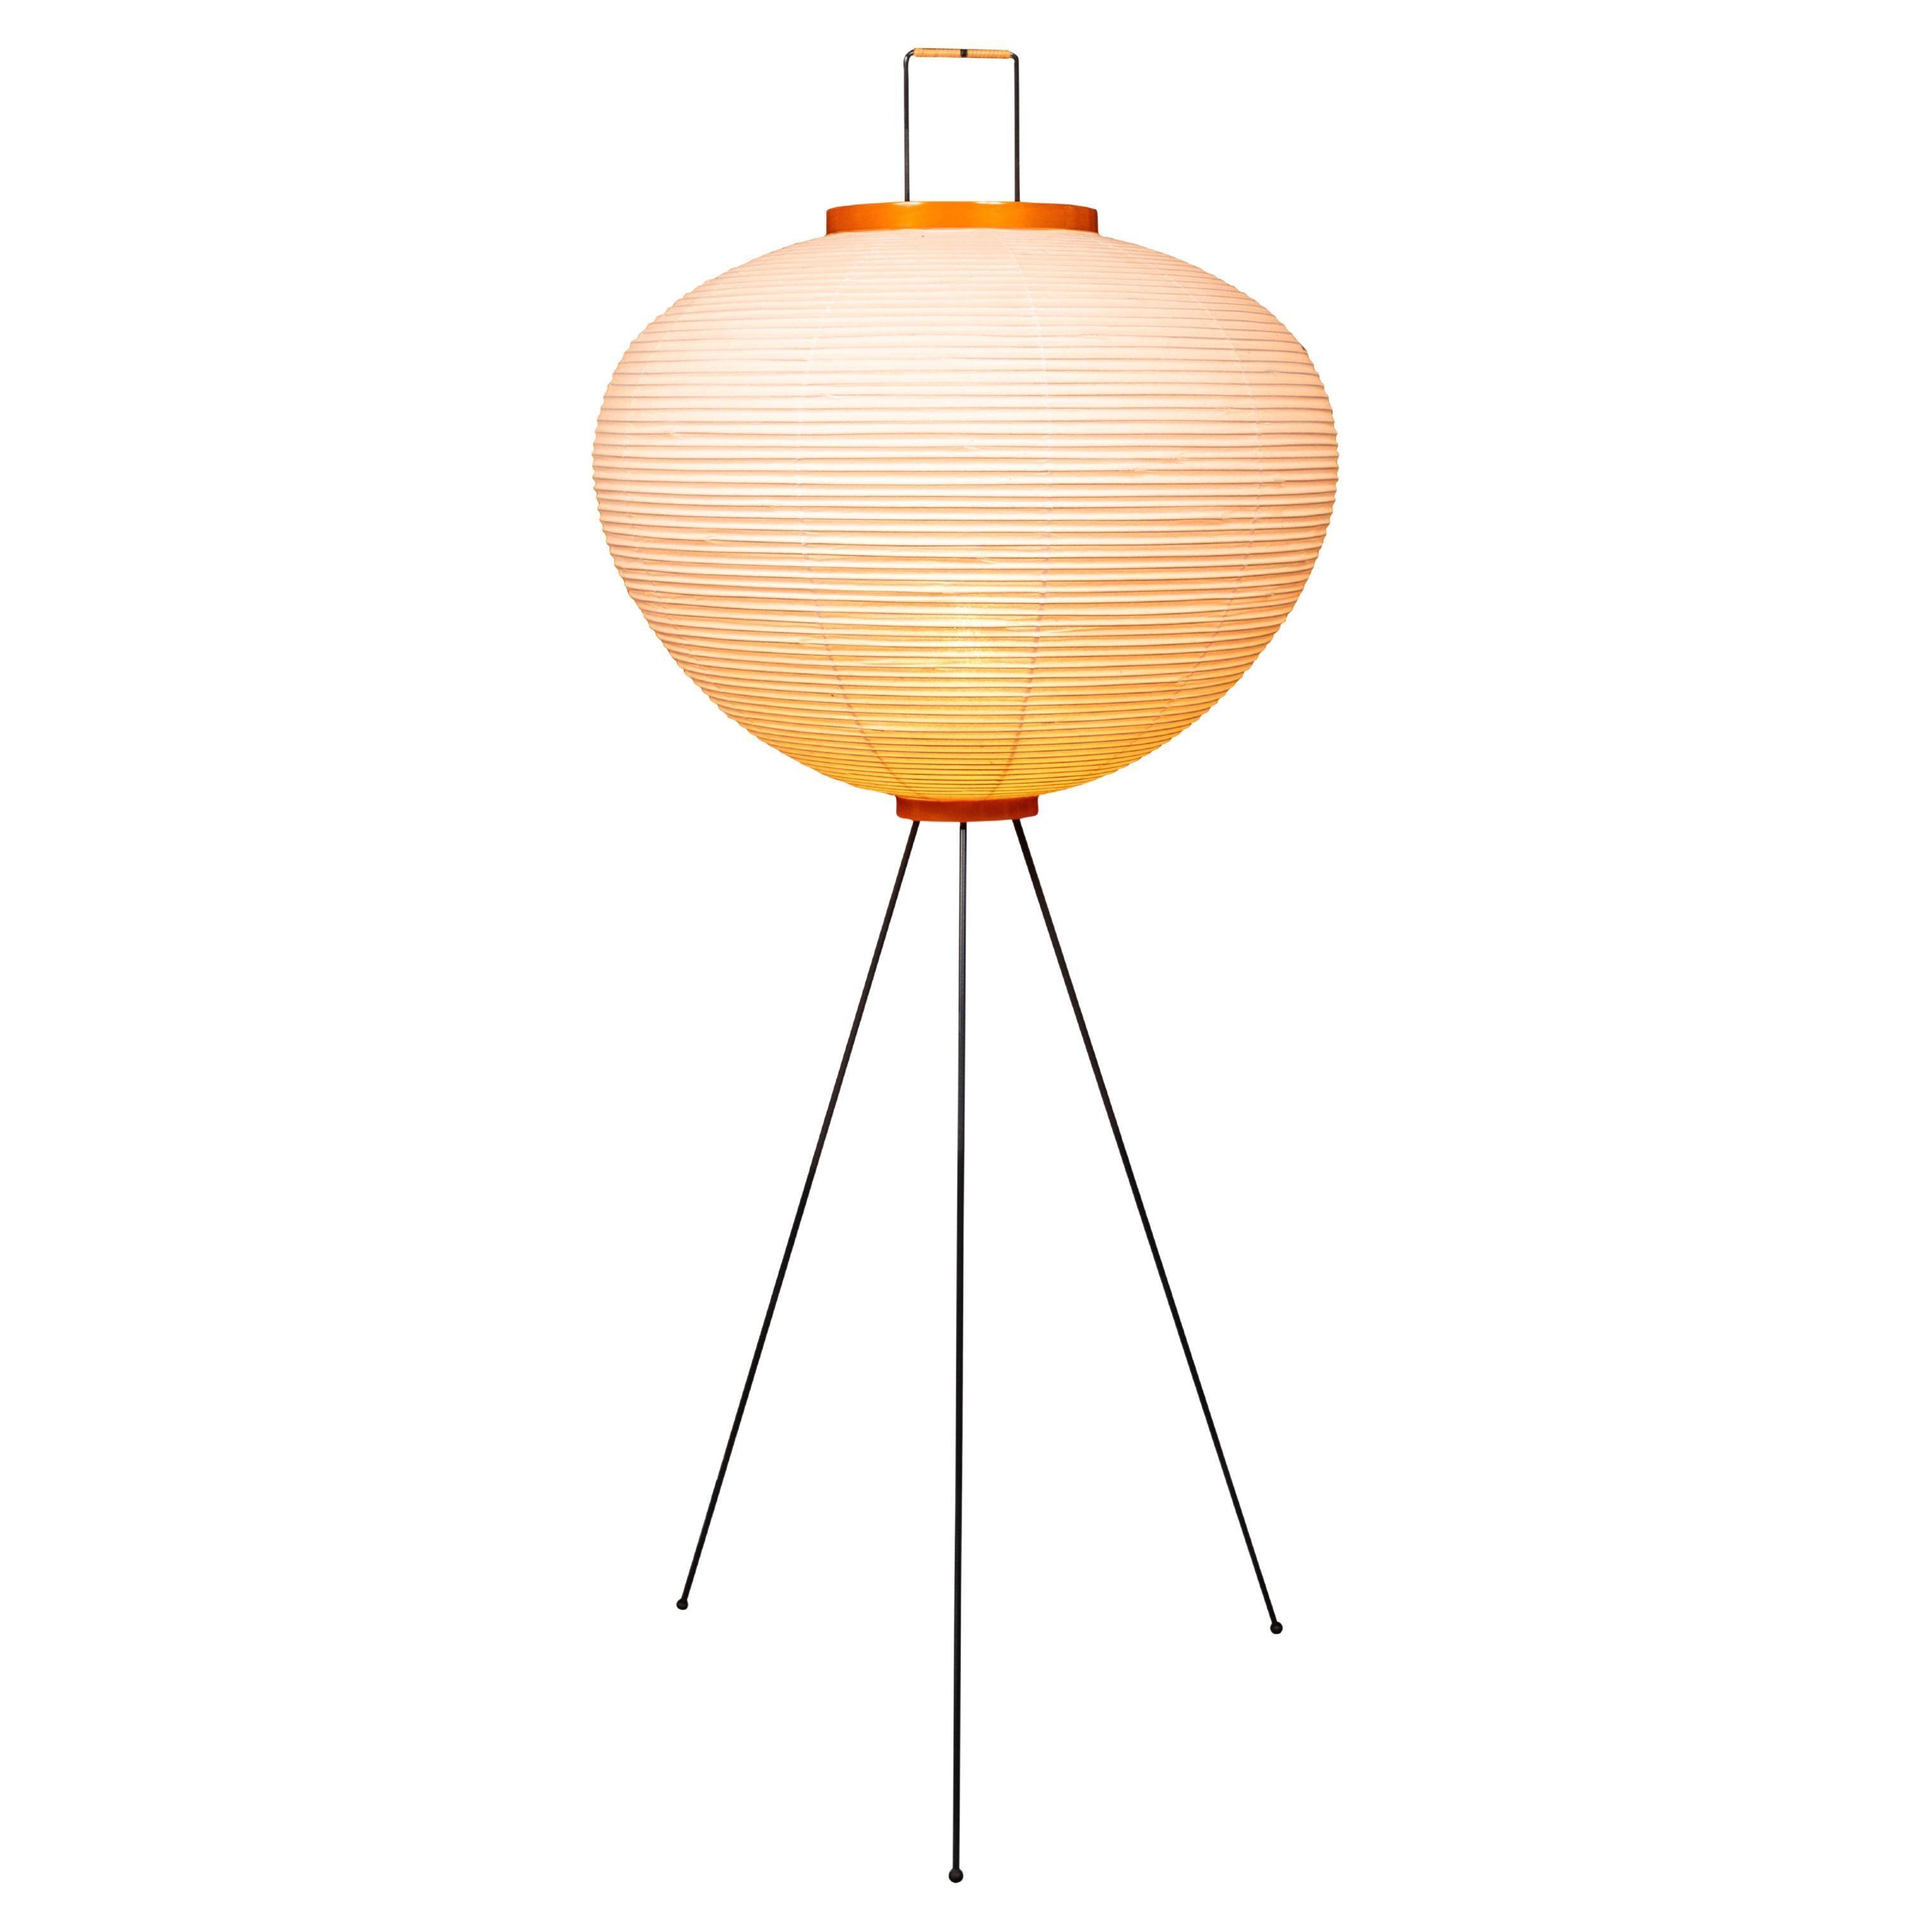 Isamu Noguchi Akari 10A Floor Lamp with Stamped Signature